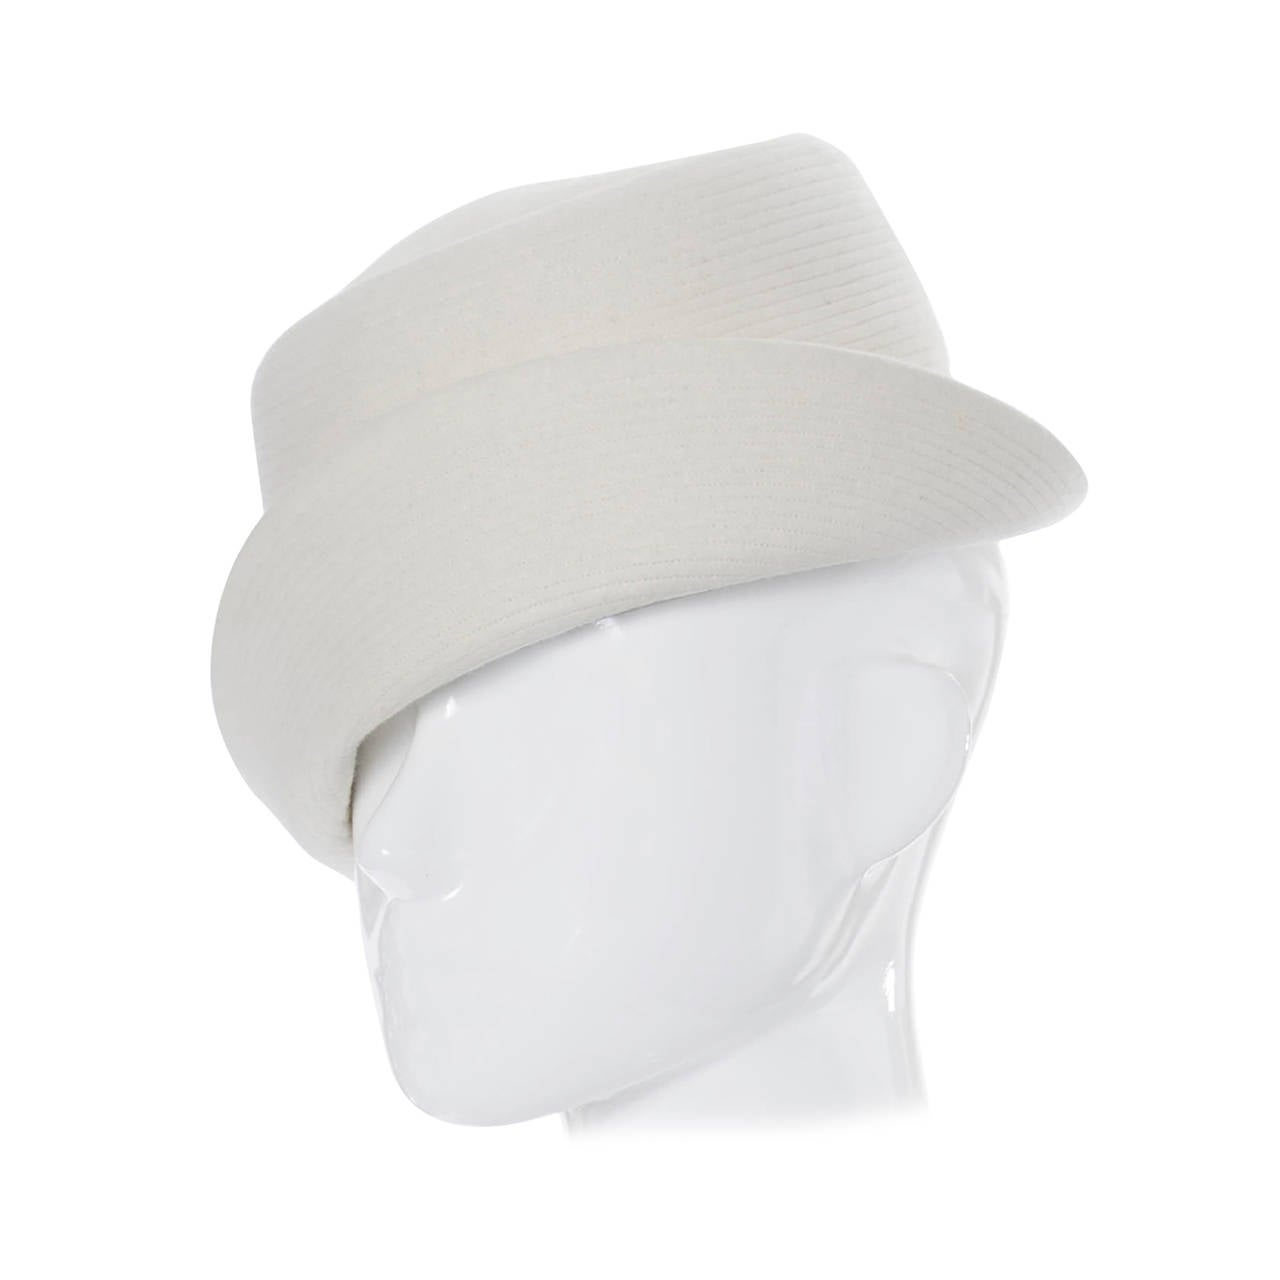 Mr John I Magnin Vintage Hat Winter White Wool Mod 1960s